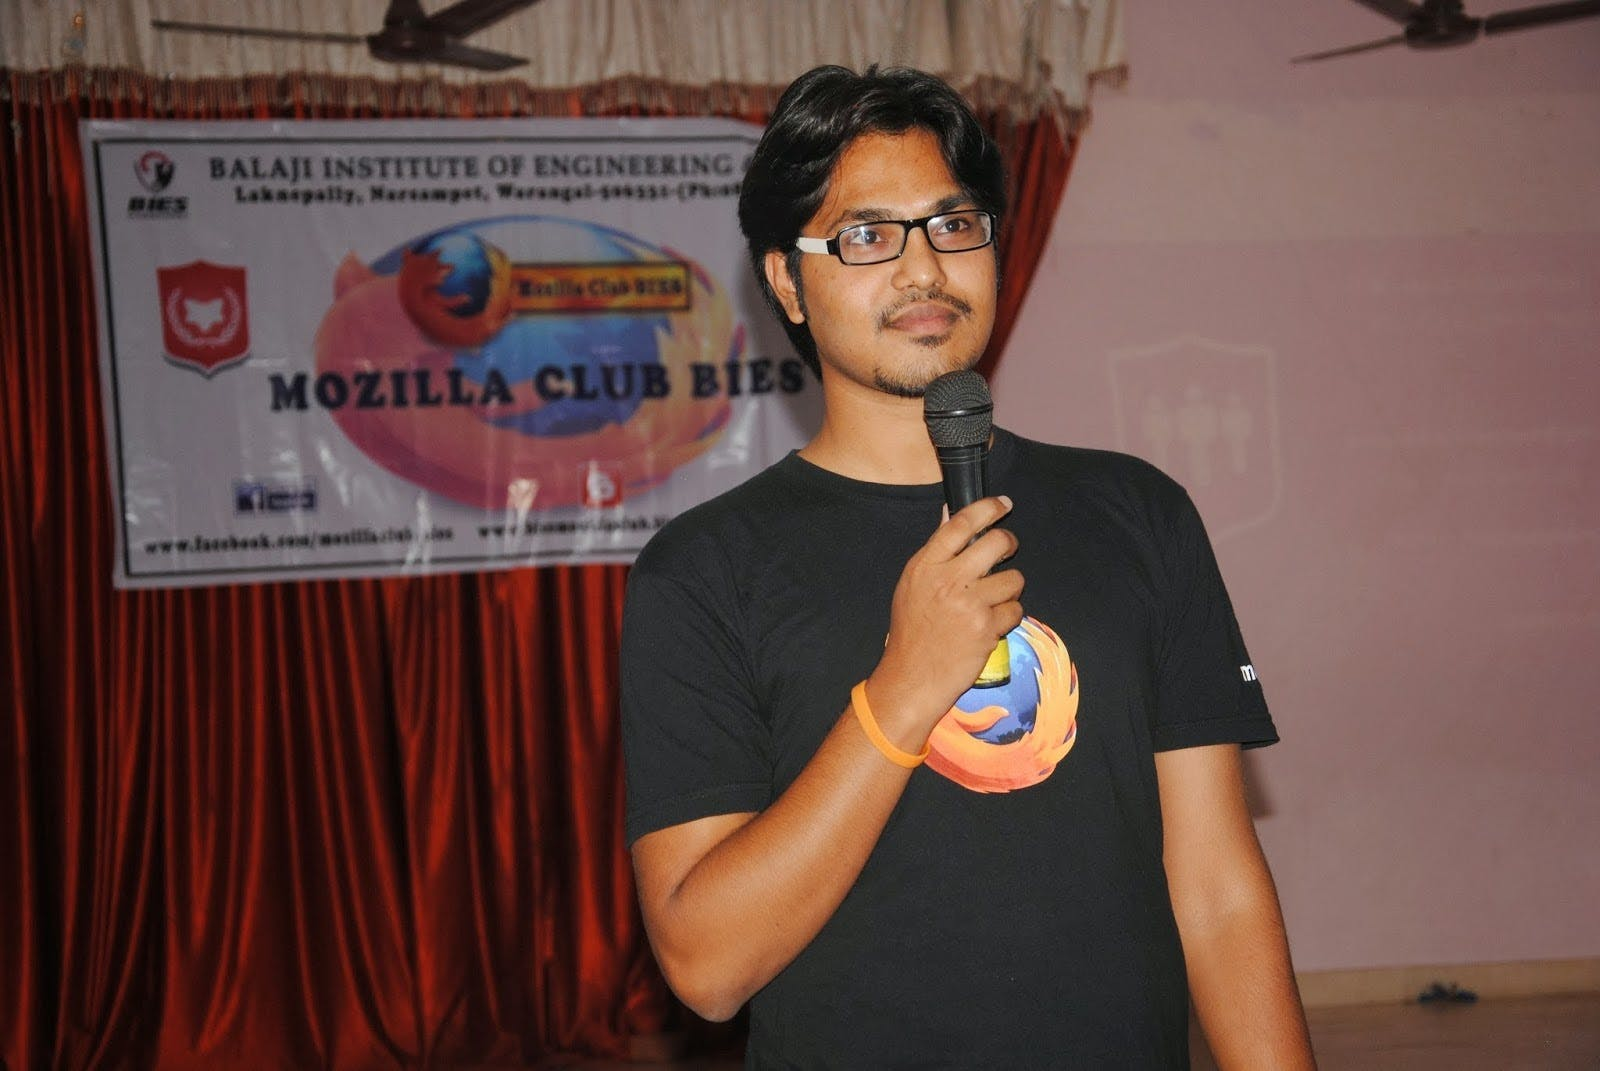 Ajay Kumar Jogawath